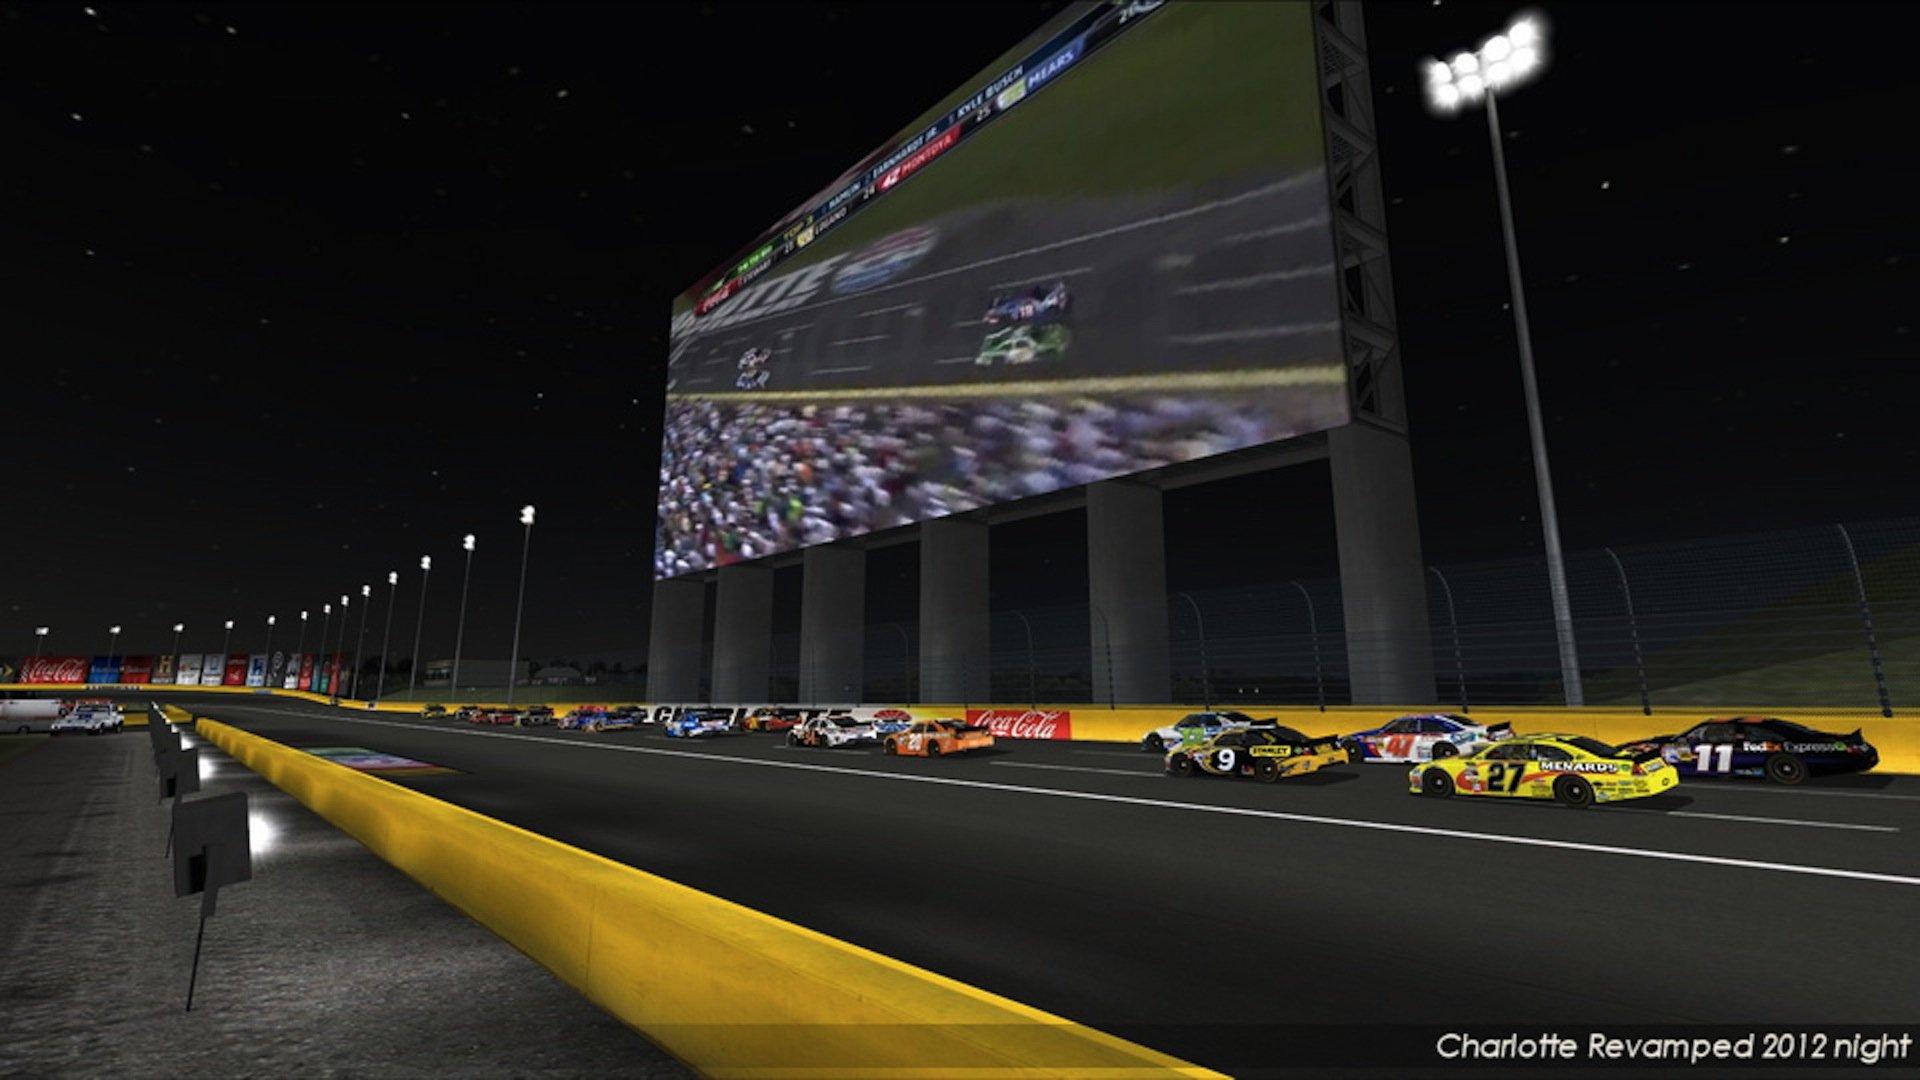 Nr2003 Charlotte Motor Speedway 2012 Night Edition